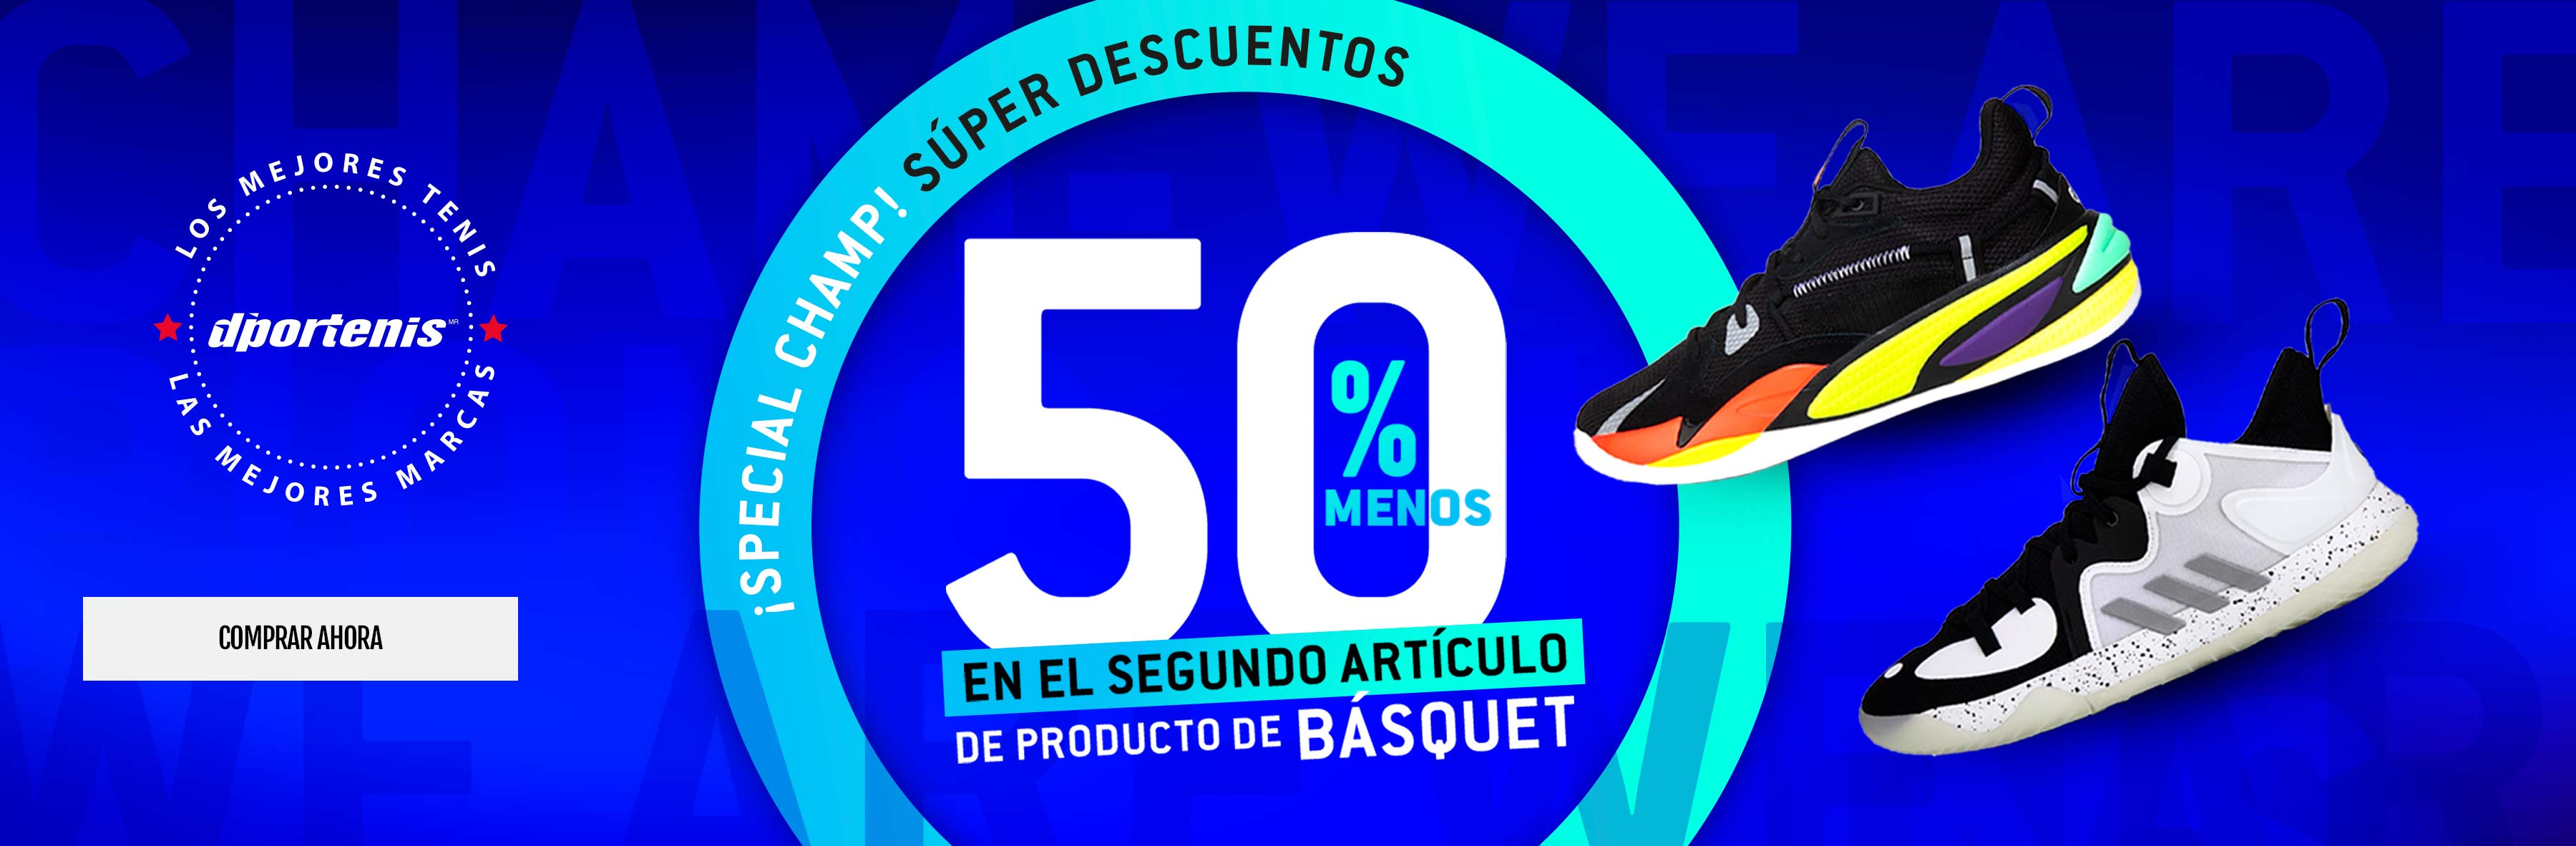 50% SEGUNDO ARTICULO BASQUETBOL